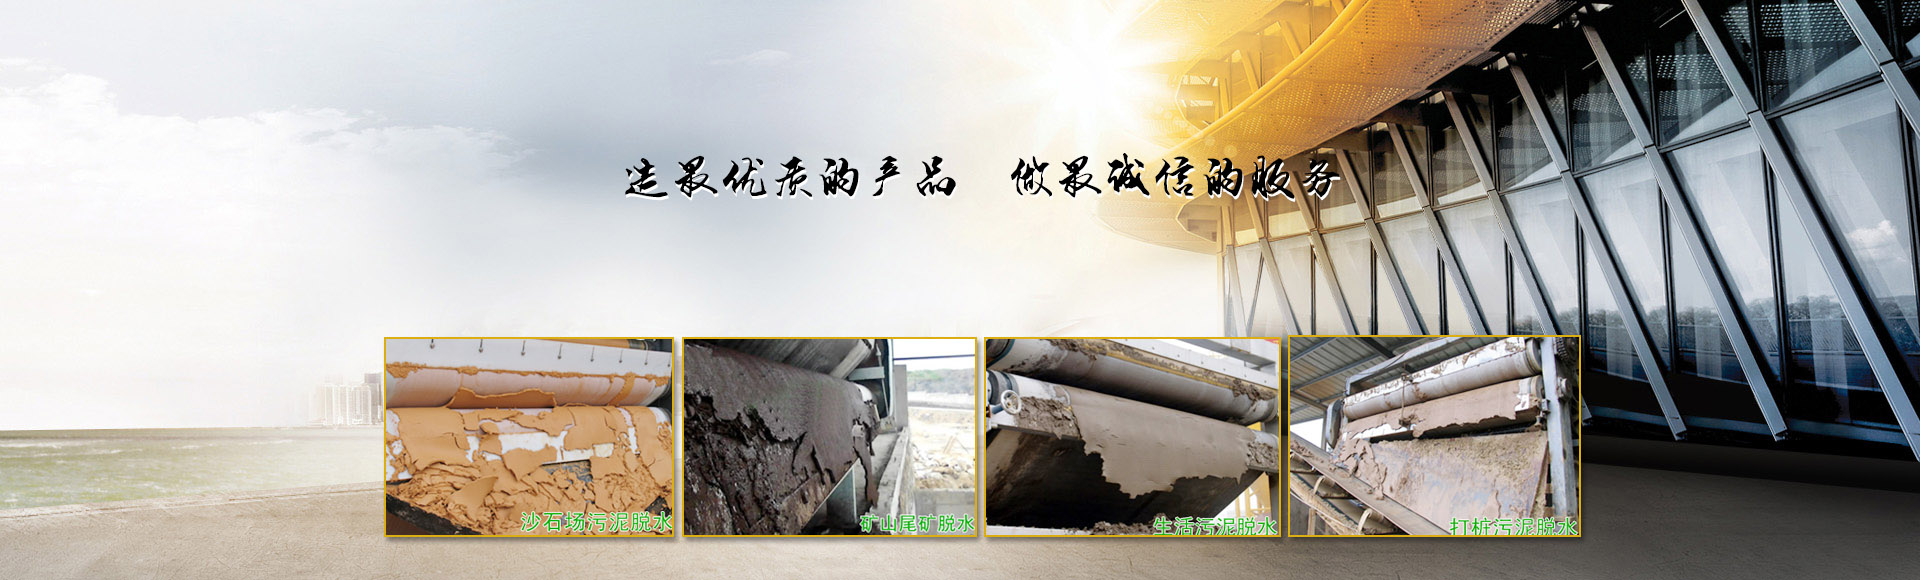 VOC废气治理设备 公司新闻